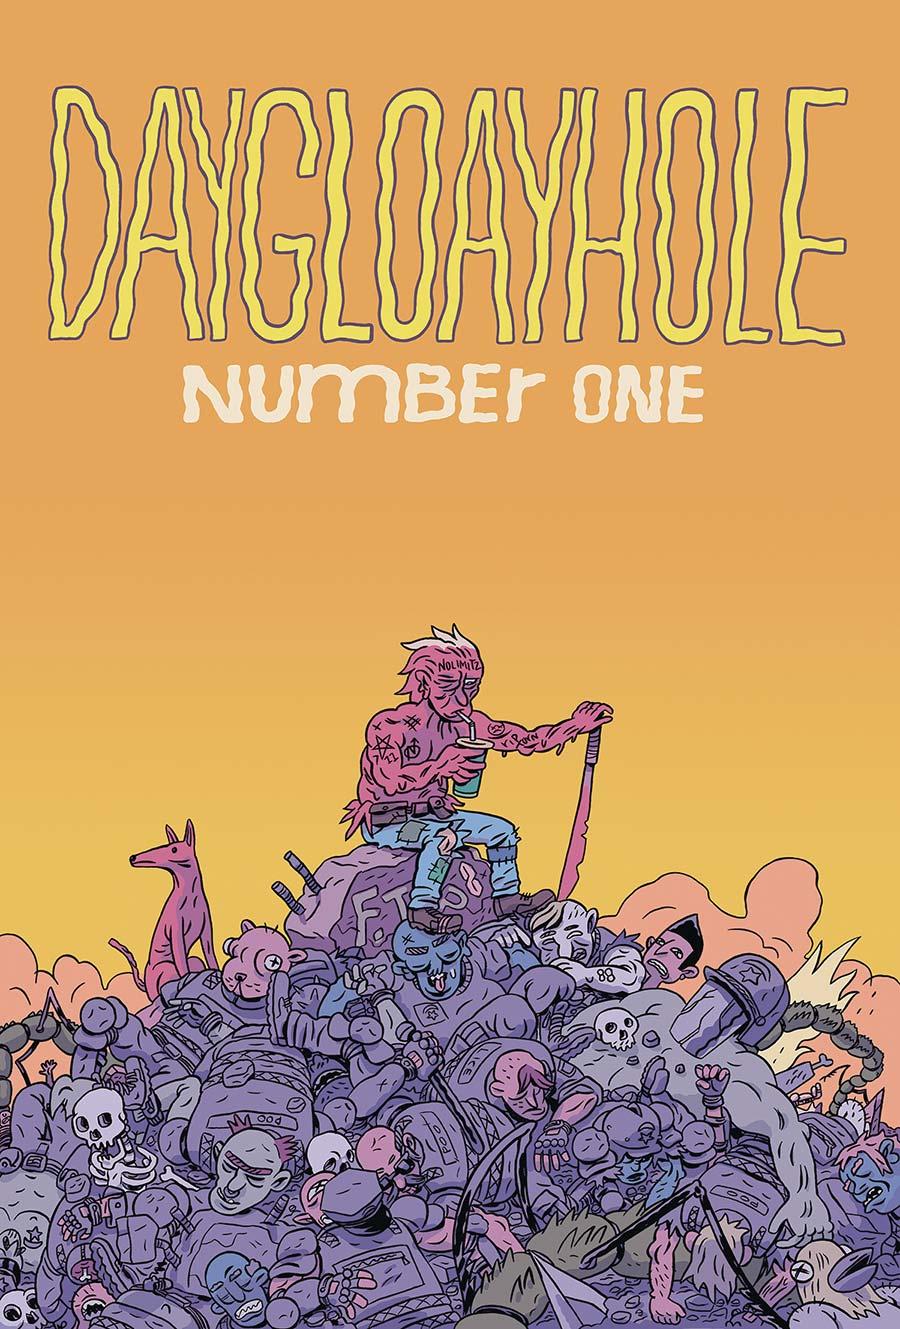 Daygloayhole